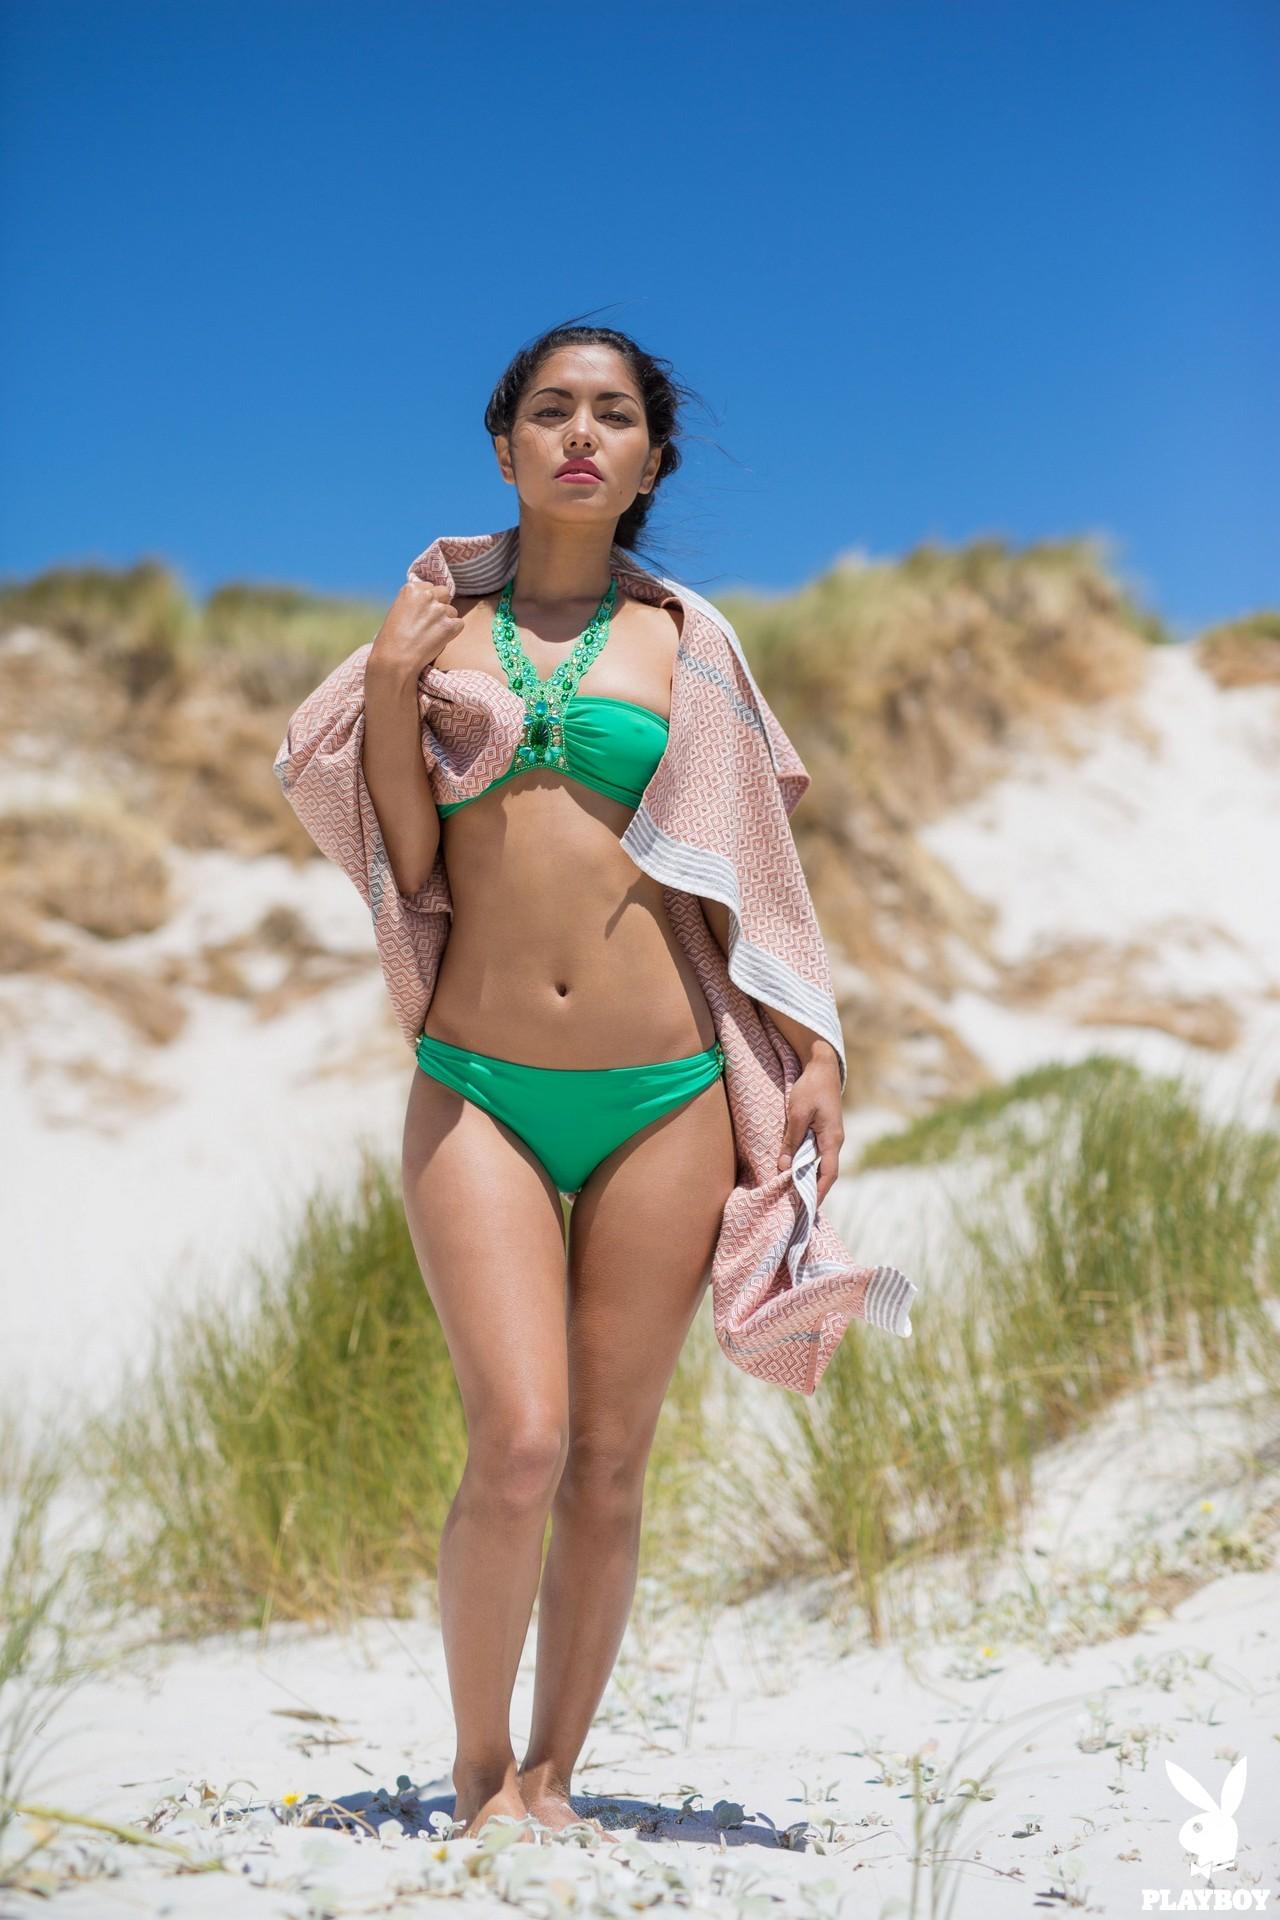 Chloe Rose in  Breezy Paradise - Playboy Plus 33